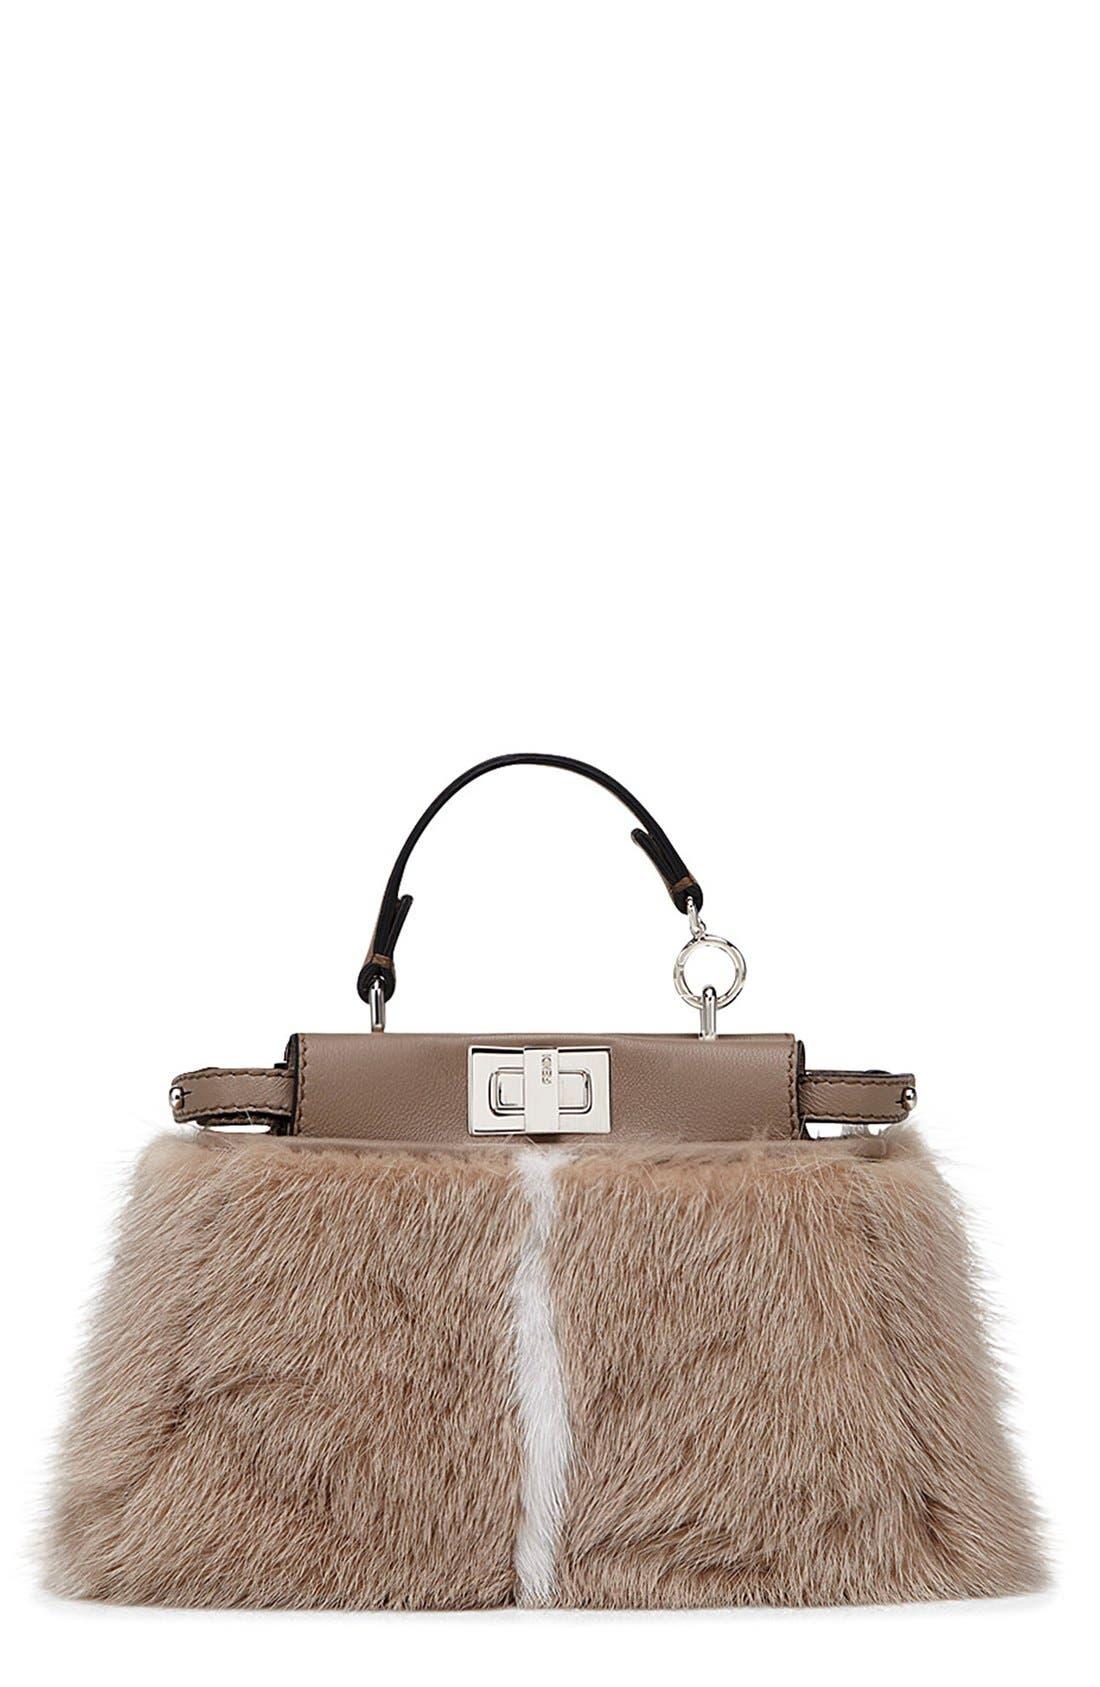 Main Image - Fendi 'Micro Peekaboo' Genuine Mink Fur & Leather Bag (Extra Small)